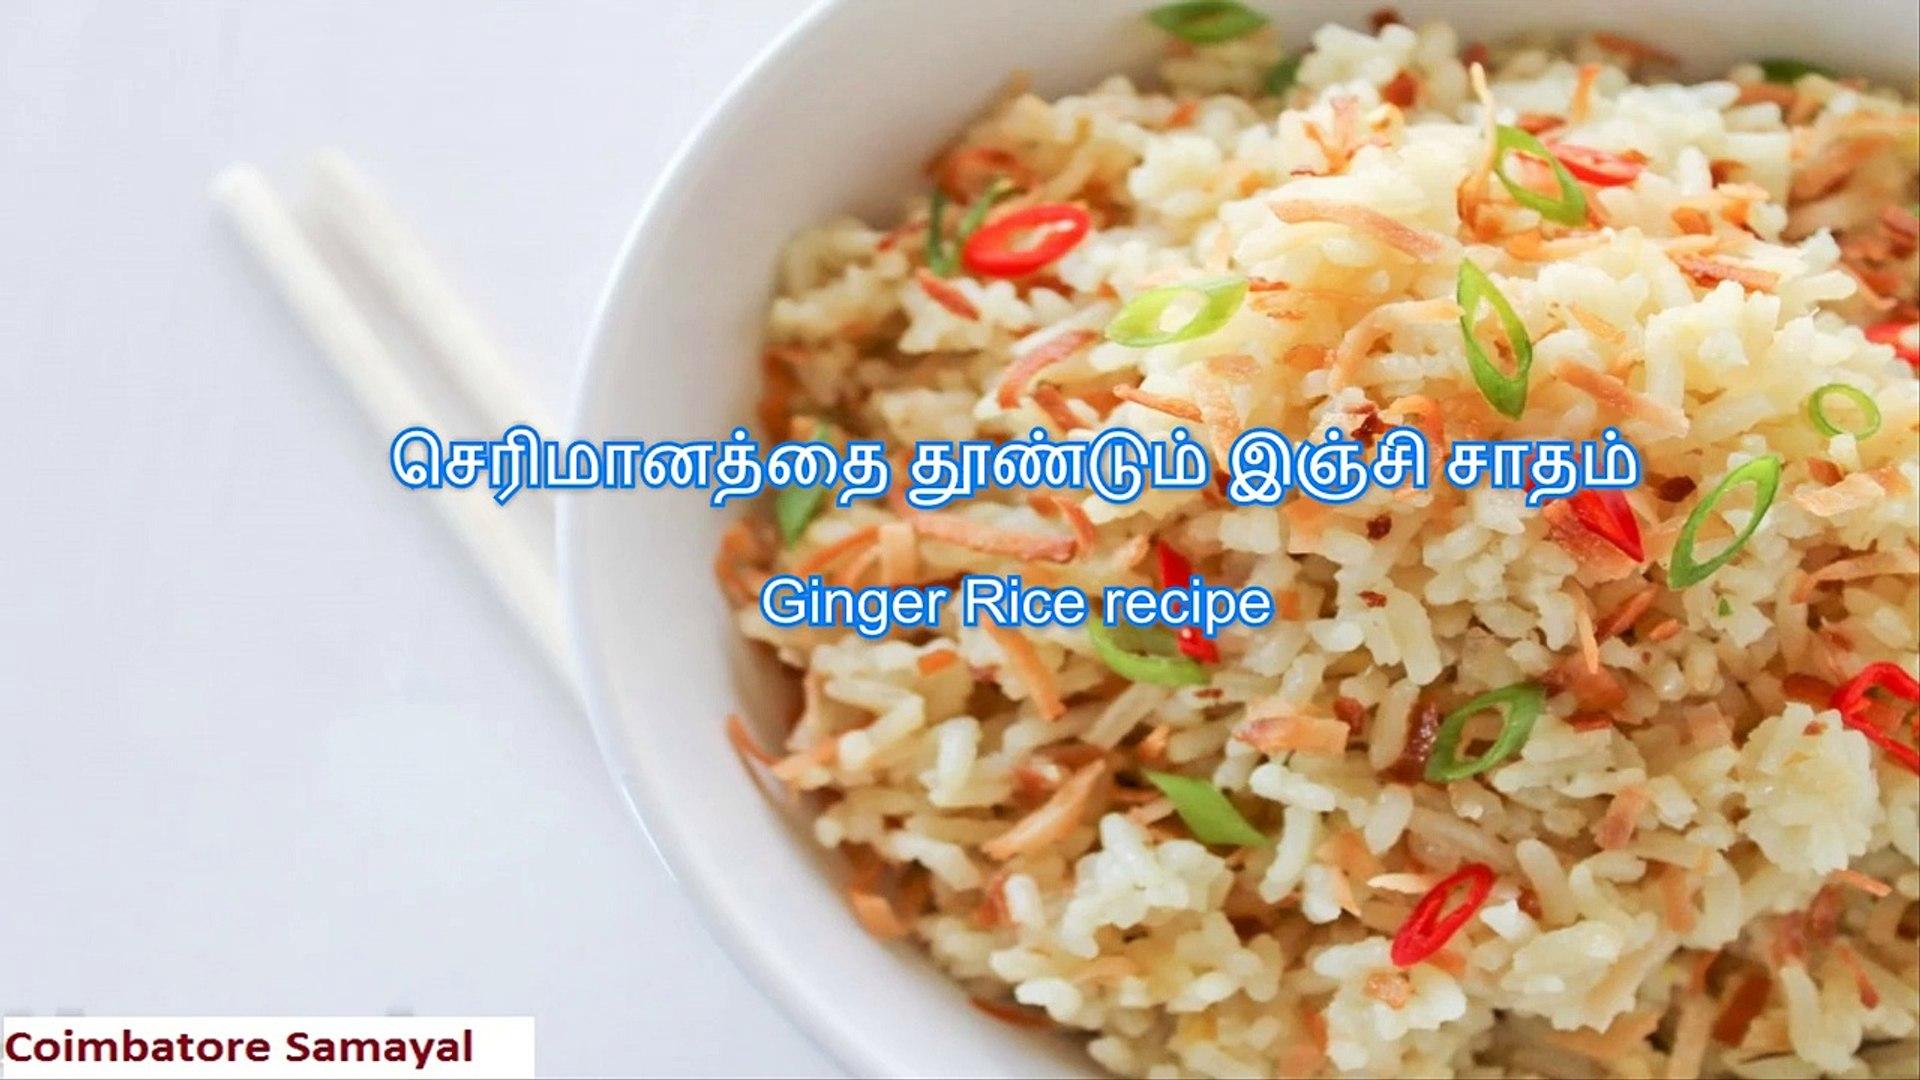 Ginger Rice recipe - செரிமானத்தை தூண்டும் இஞ்சி சாதம்